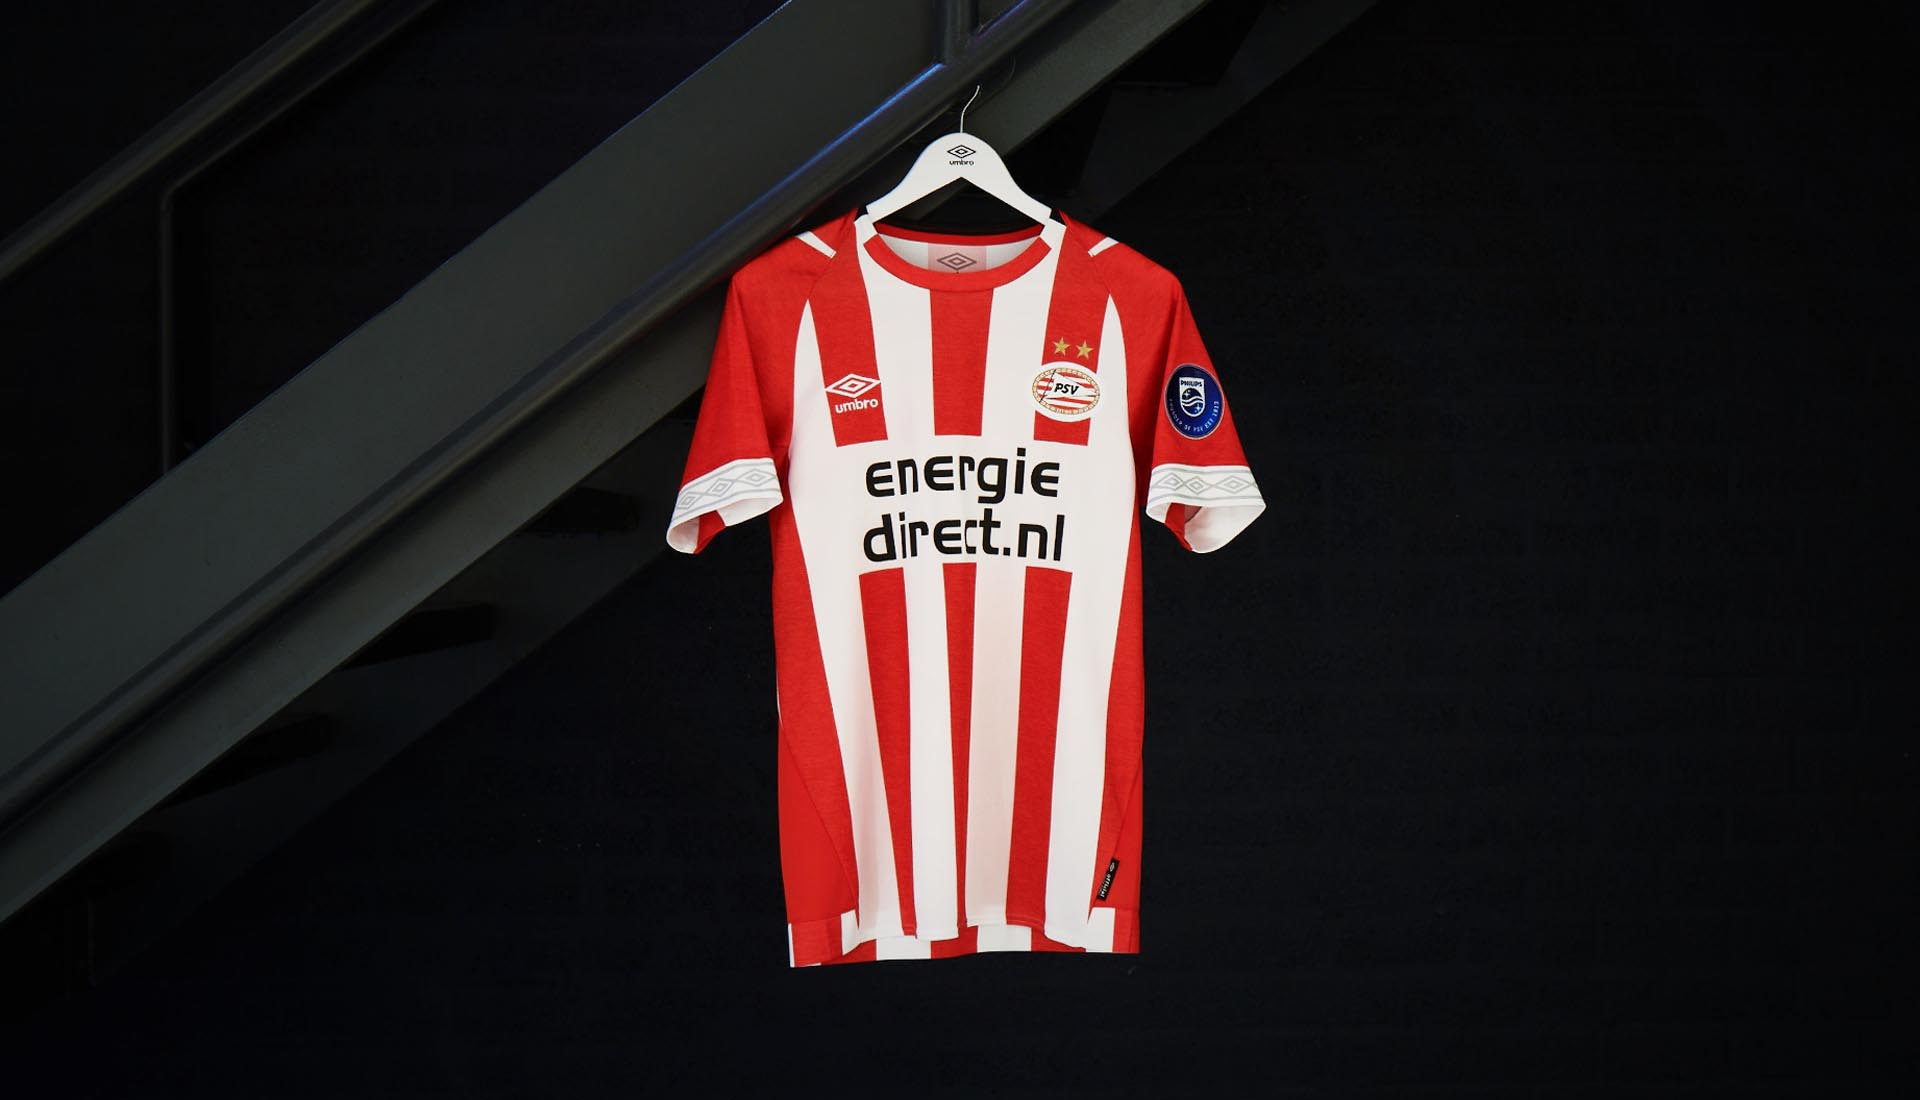 e2b8ae36c76 Umbro Launch PSV 2018/19 Home Shirt - SoccerBible